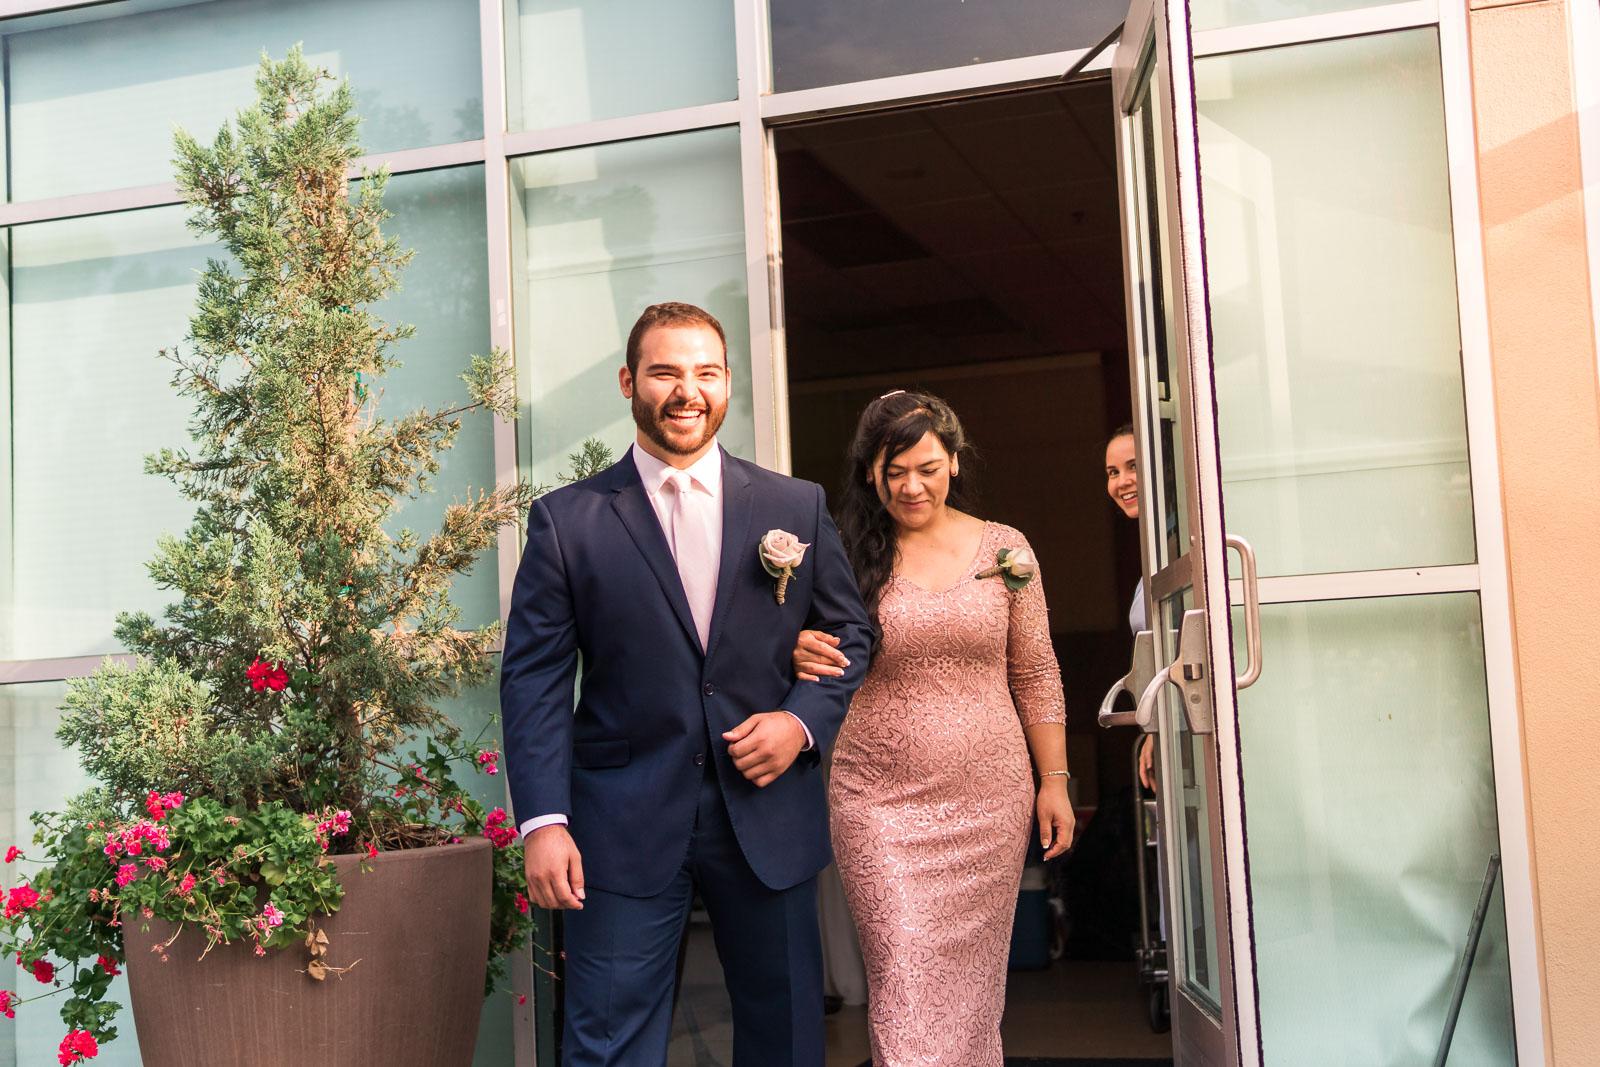 137_Angel-Brea-Orange-County_Joseph-Barber-Wedding-Photography.jpg